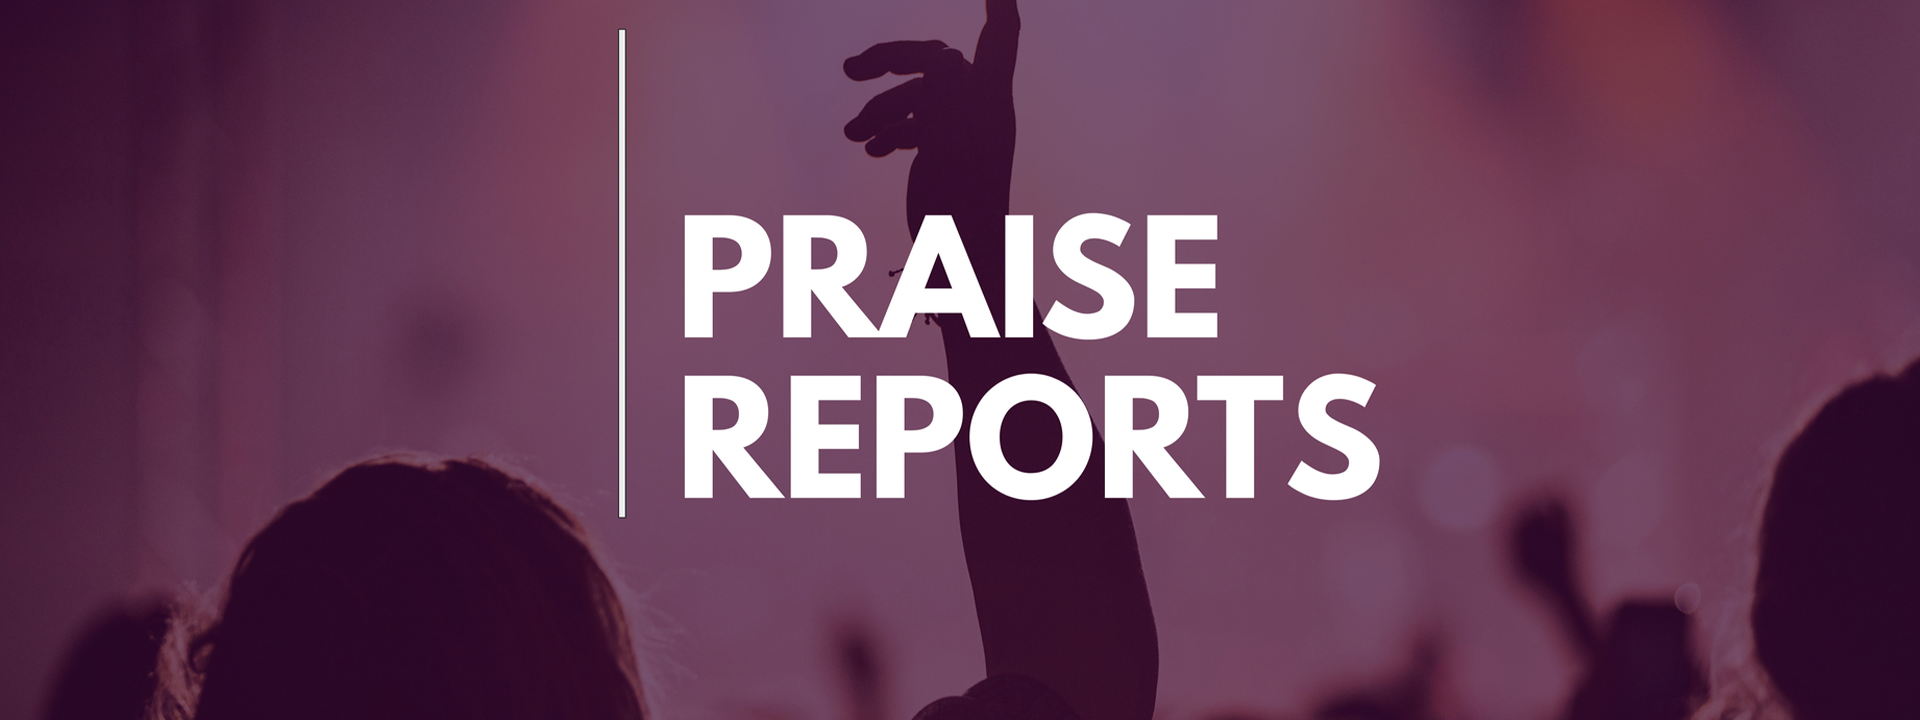 banner-praise-reports-1920x720